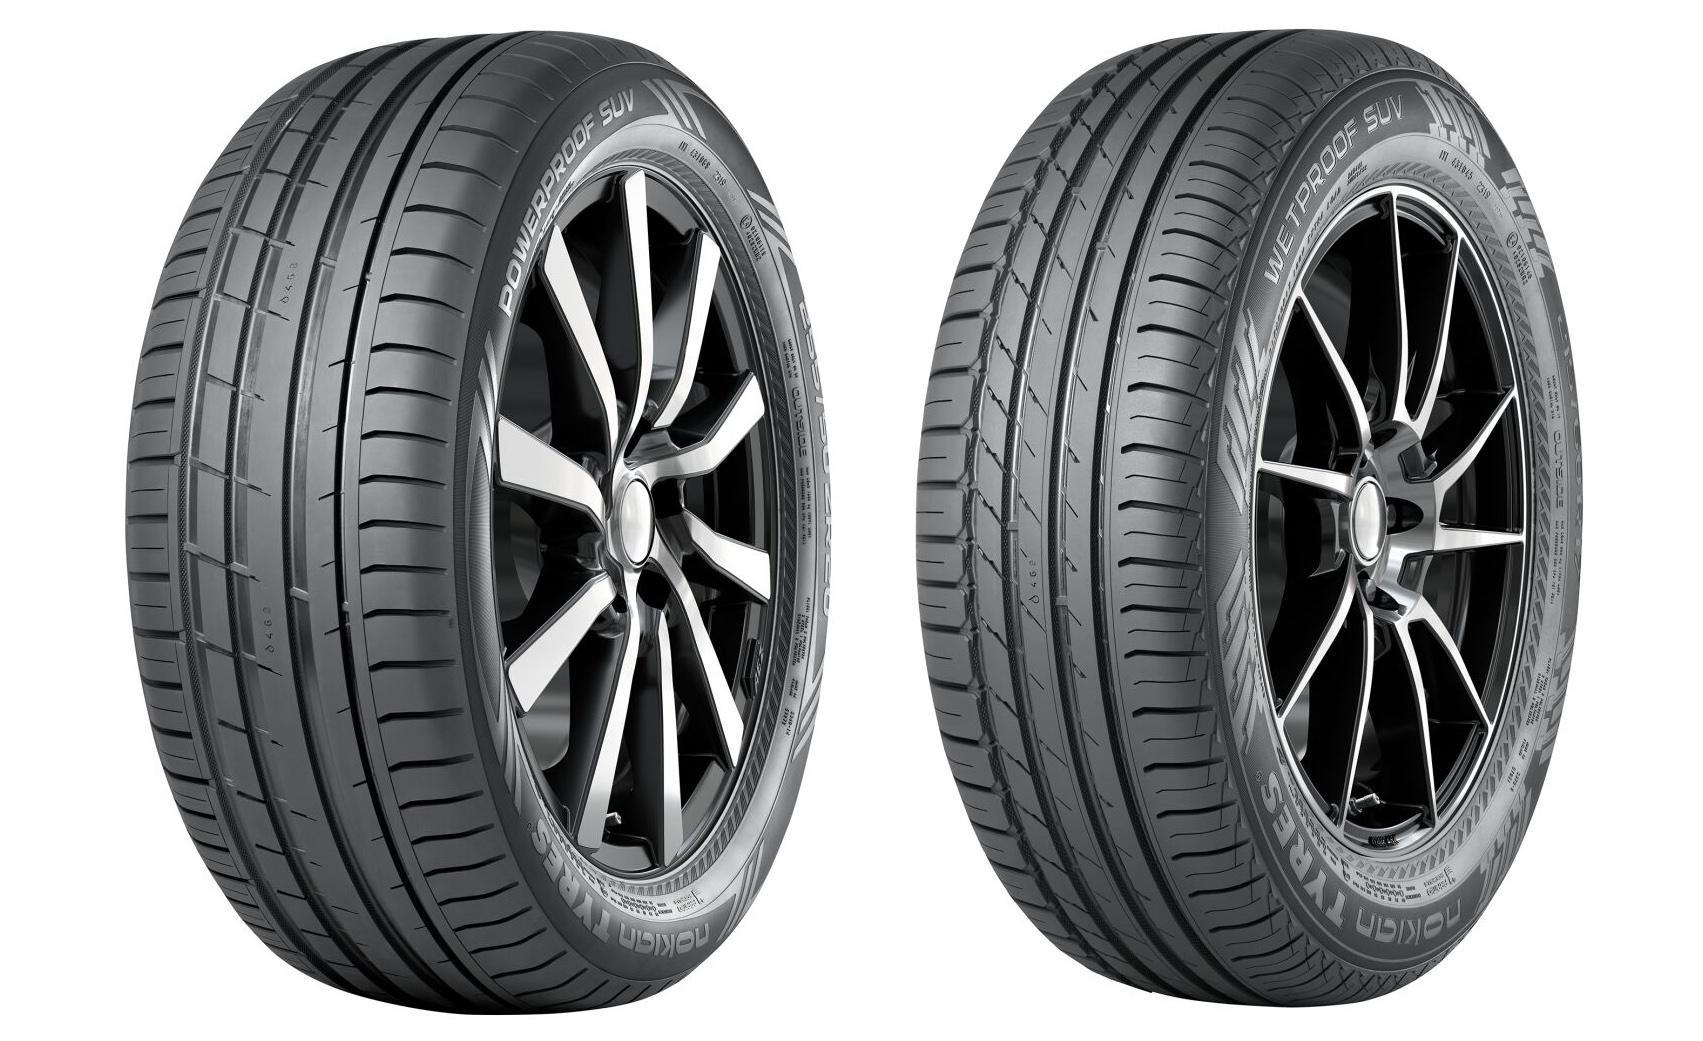 Nokian Tyres представила новые модели летних шин Powerproof SUV и Wetproof SUV